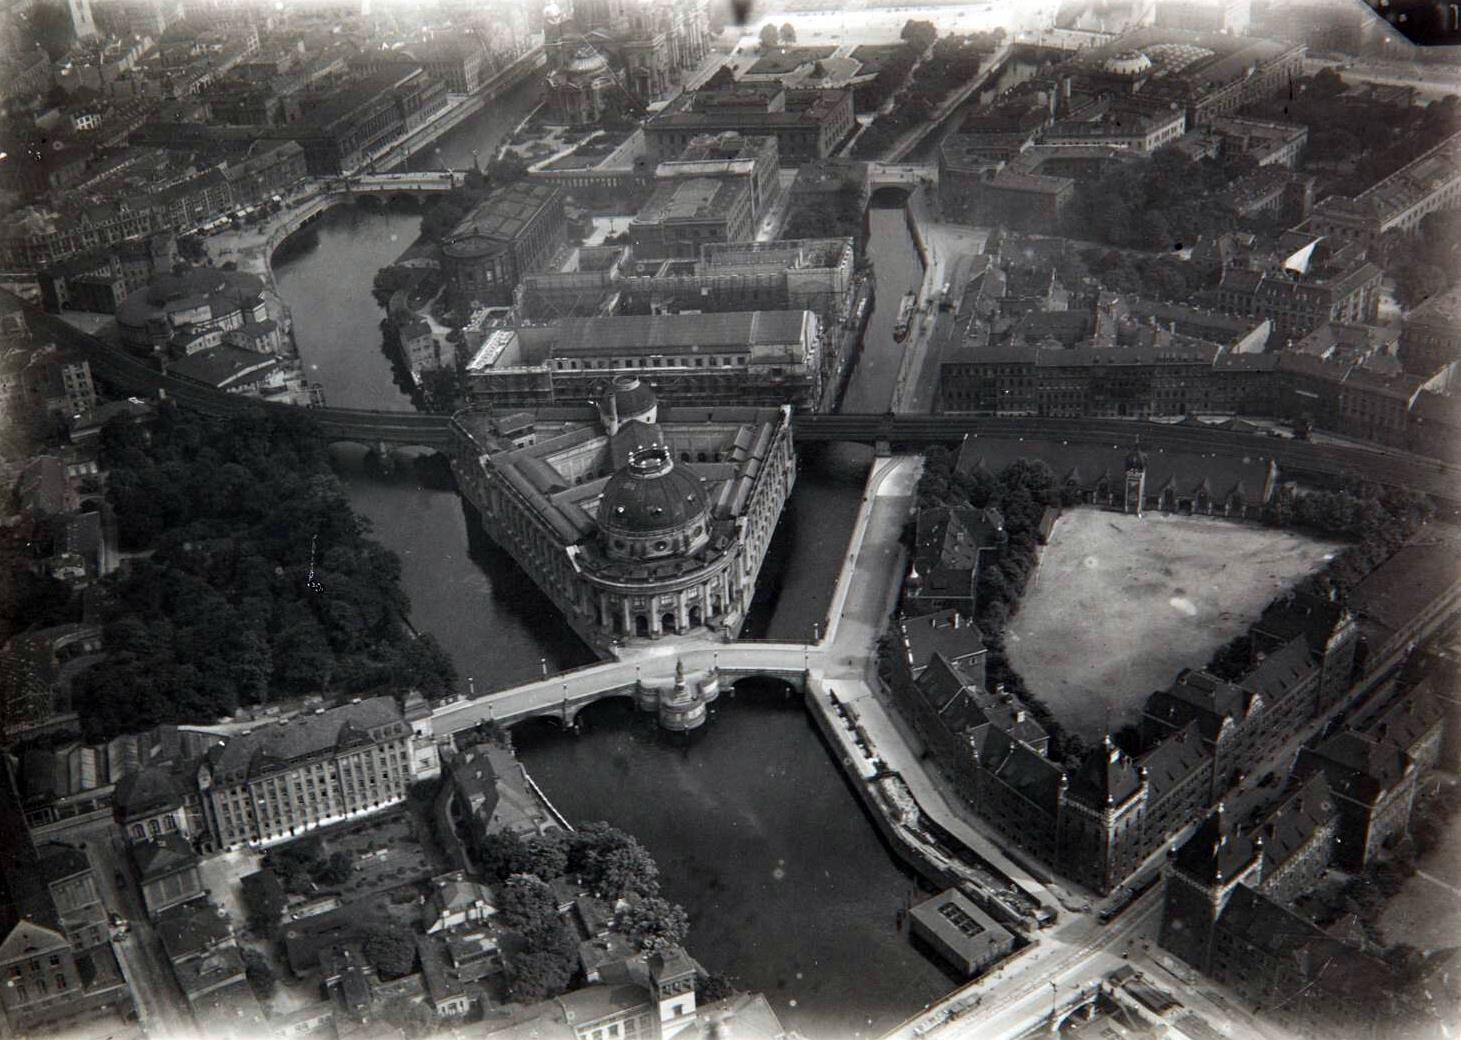 1918 Luftaufnahme Mitte Museumsinsel Und Umgebung Aero Lloyd Luftbild Gmbh Berlin Thomas Black And White